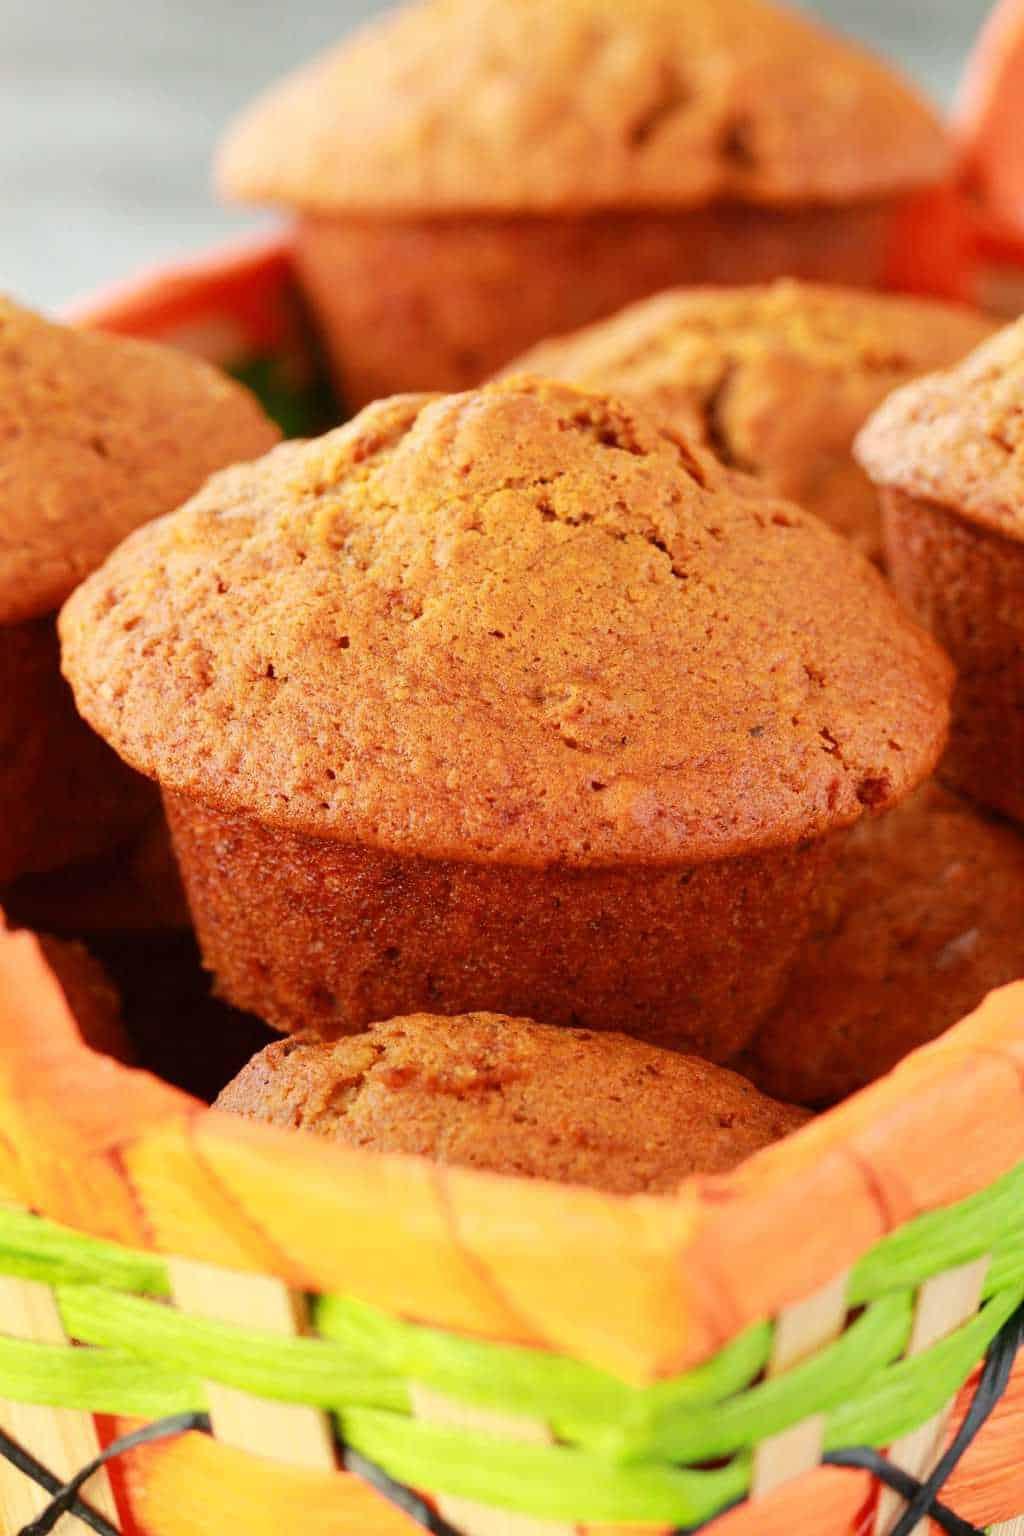 Vegan pumpkin muffins in an orange and green muffin basket.